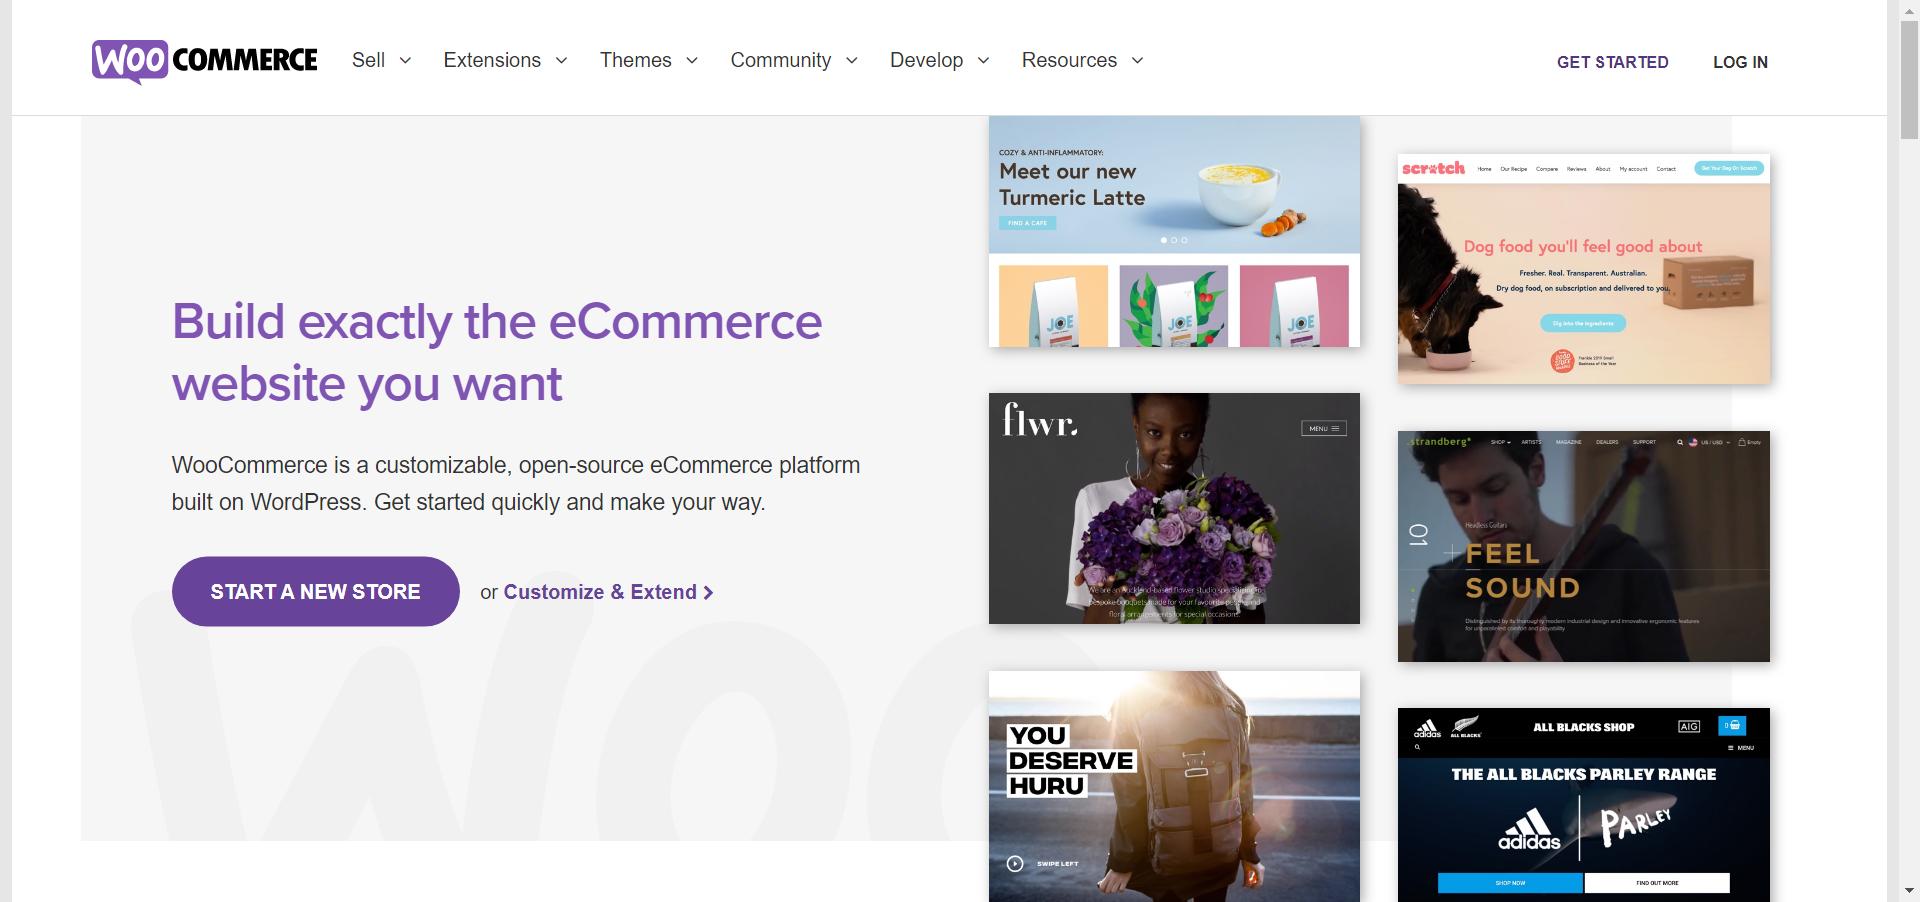 woocommerce-wordpress-site